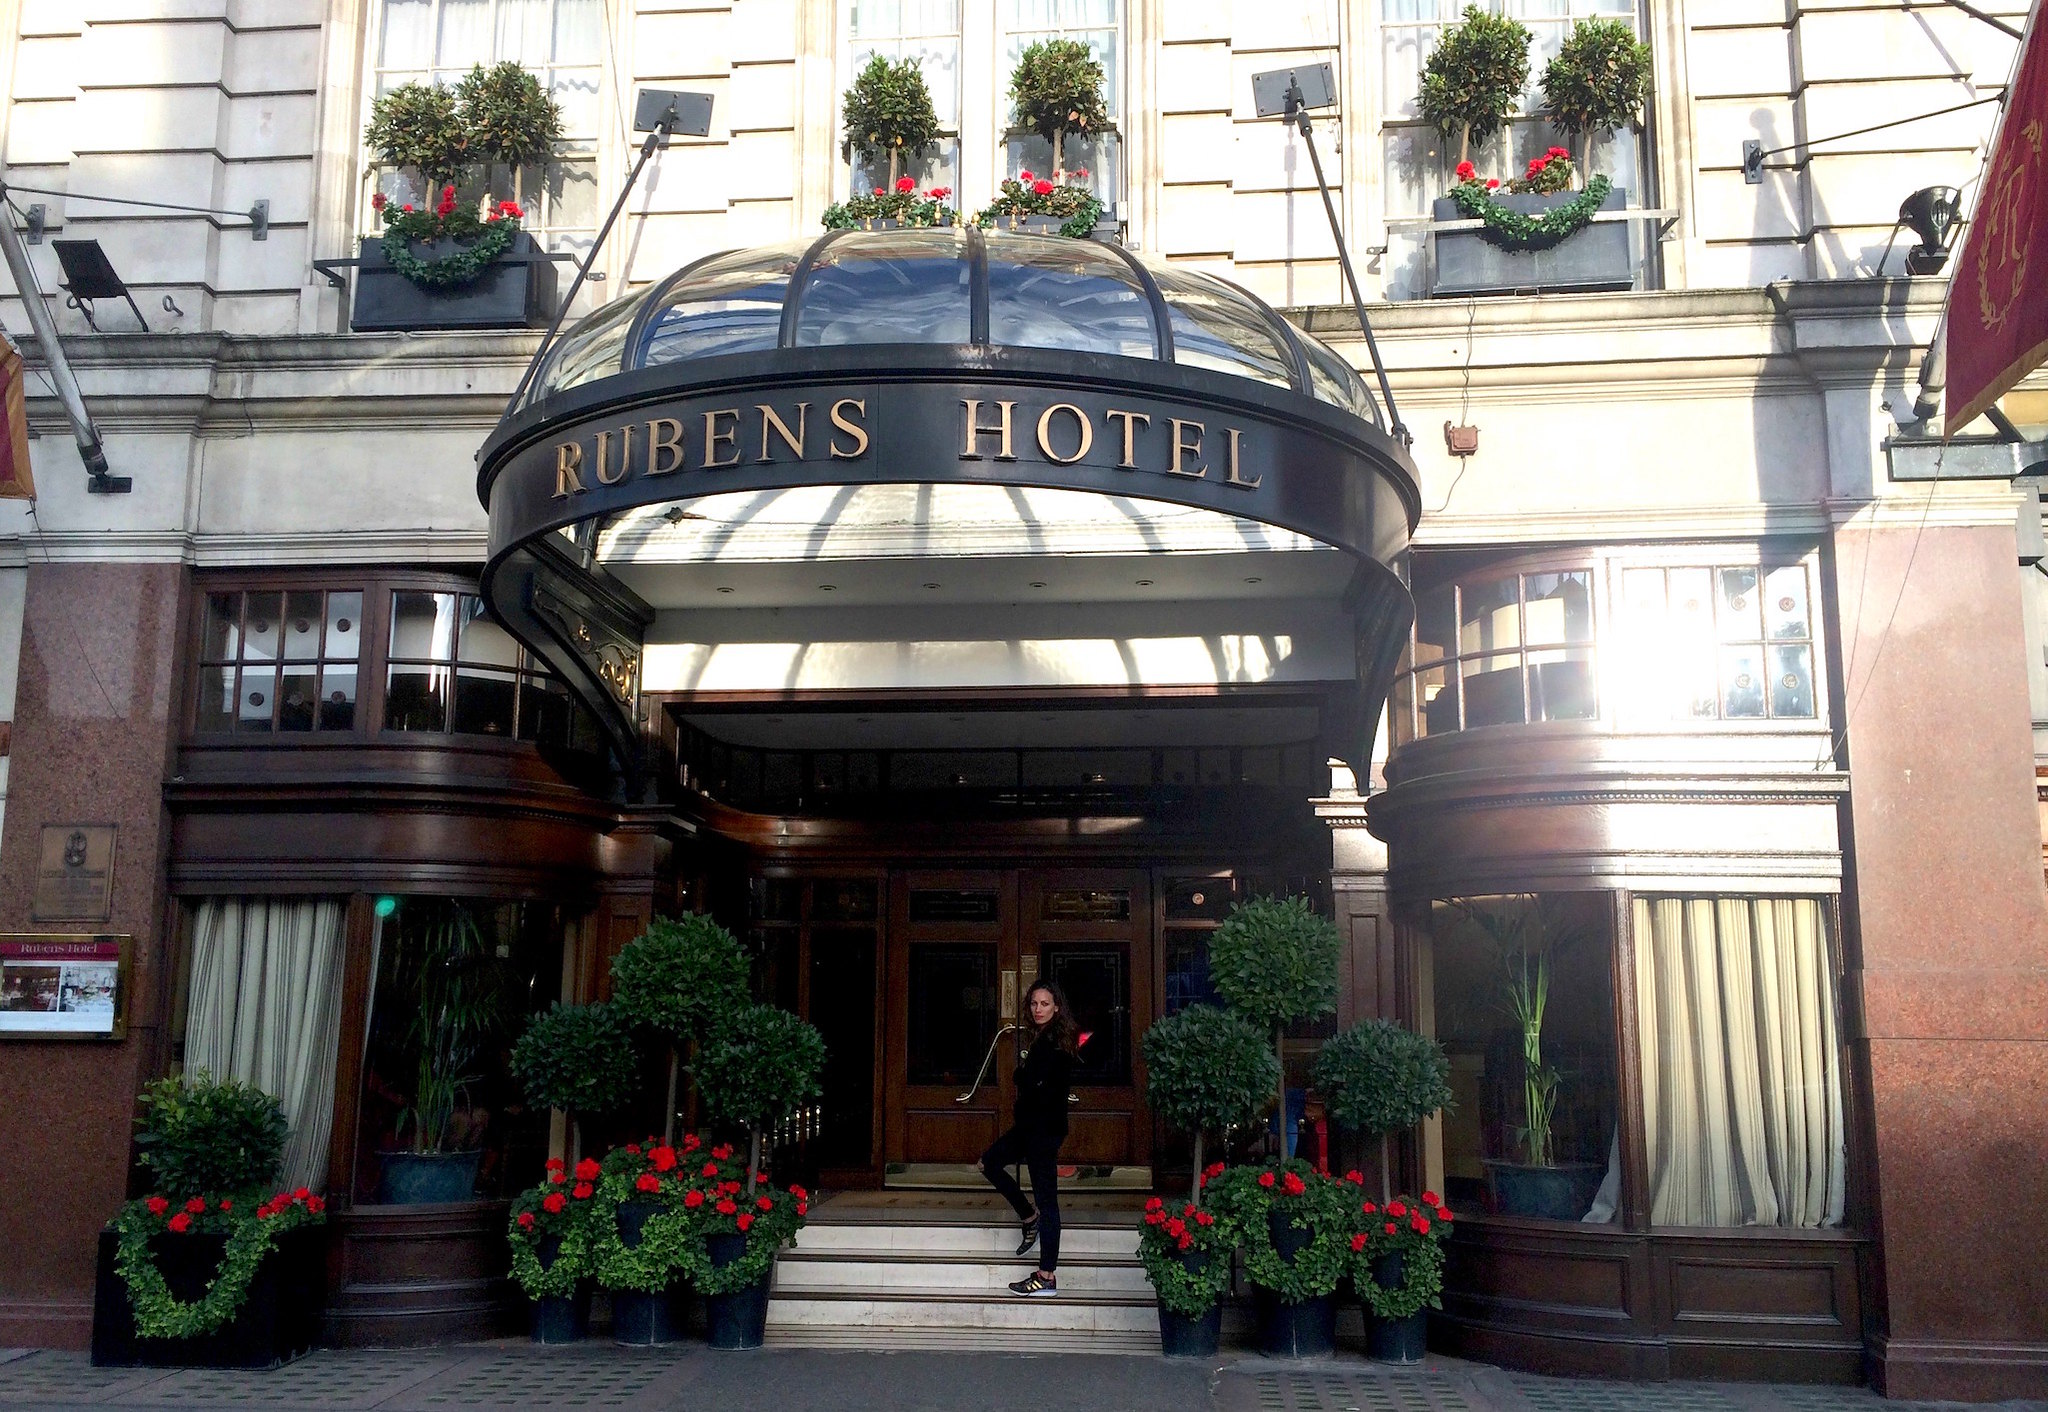 The Rubens Hotel R